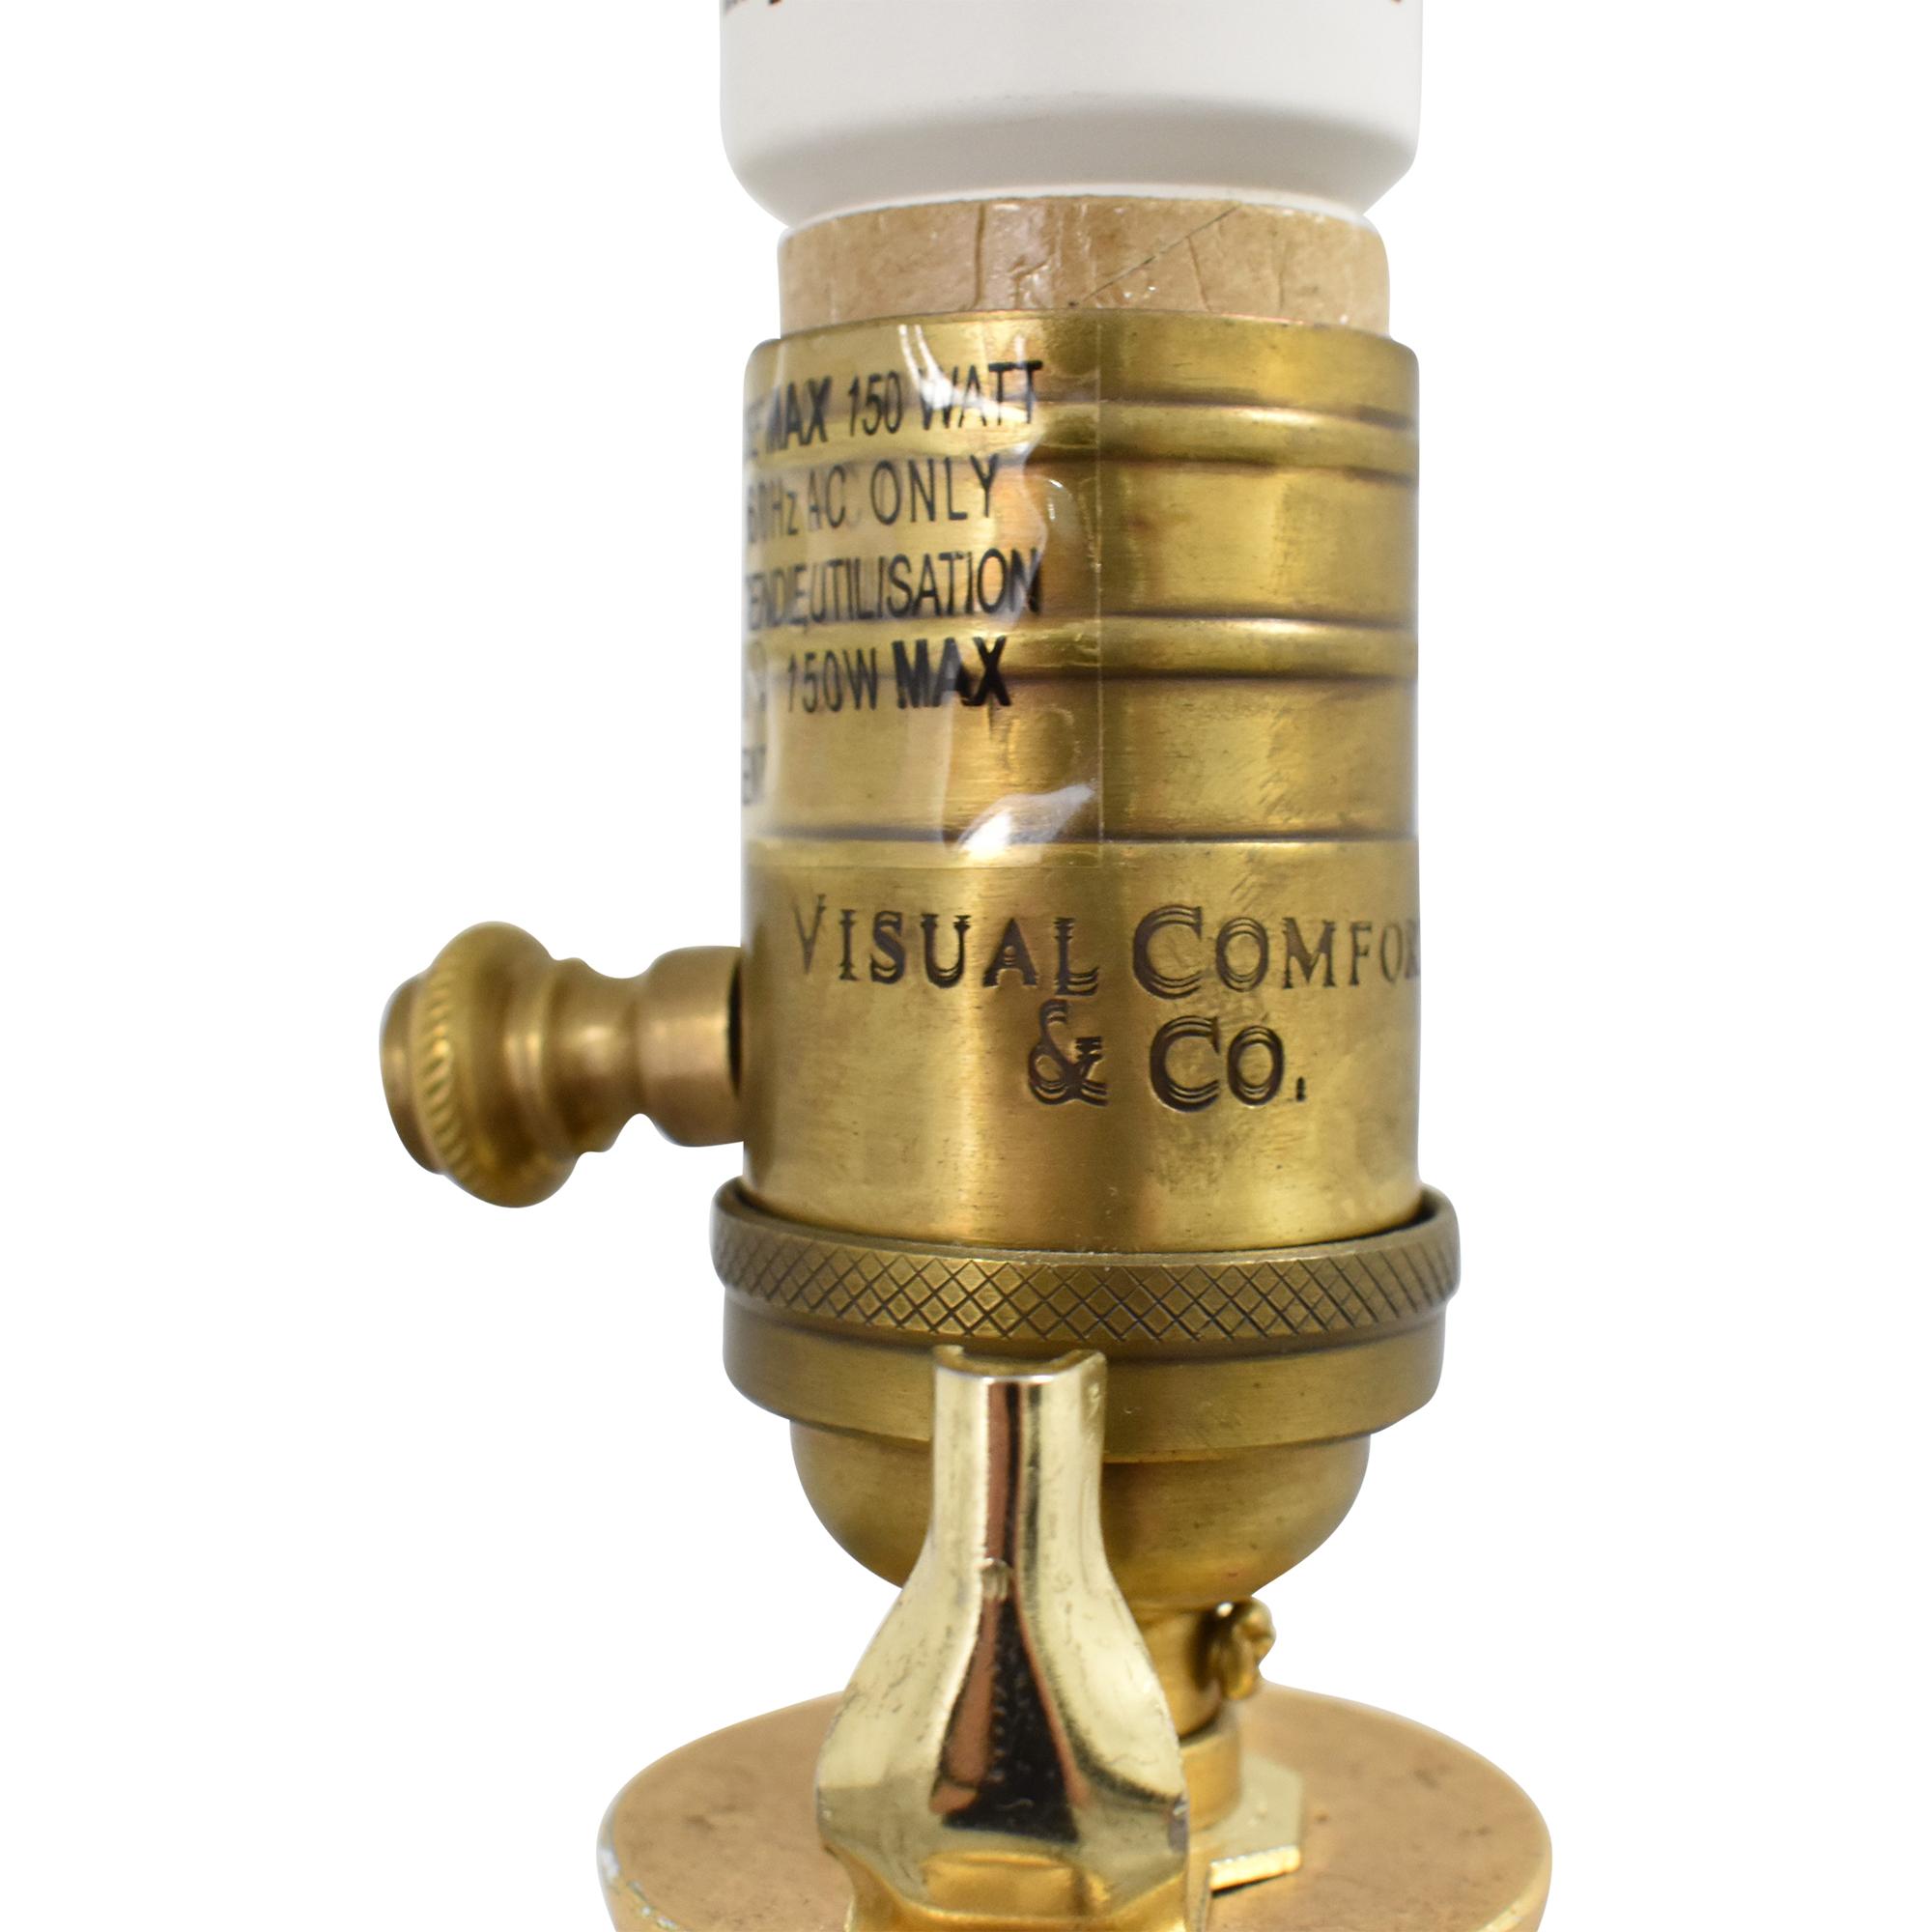 Visual Comfort Visual Comfort Dover Floor Lamp gold and beige